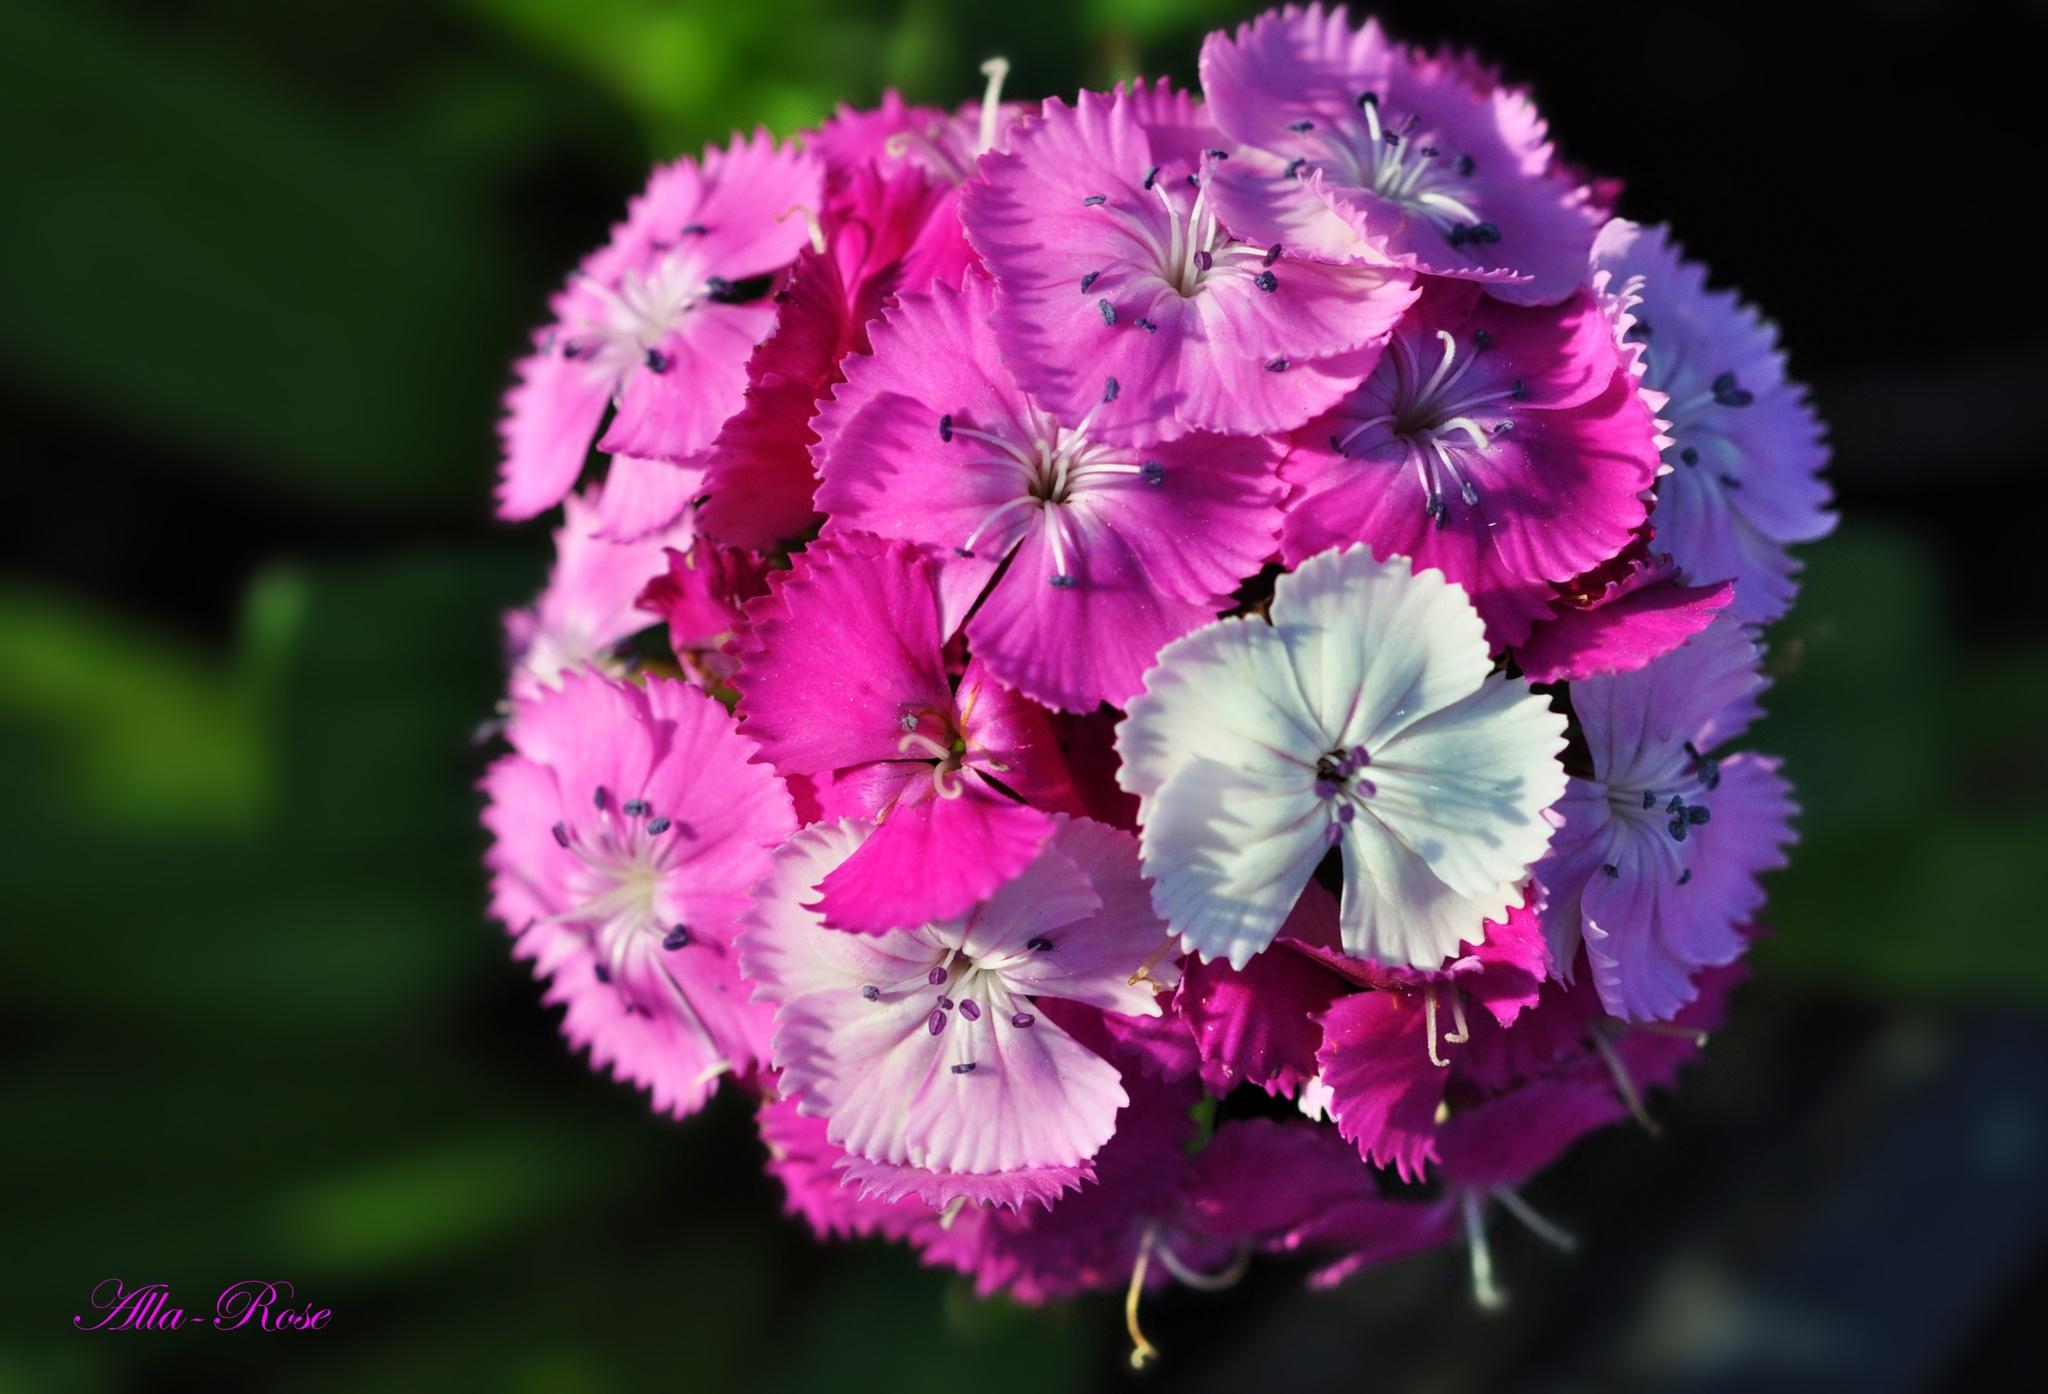 Turkish carnation 2 by Alla-Rose